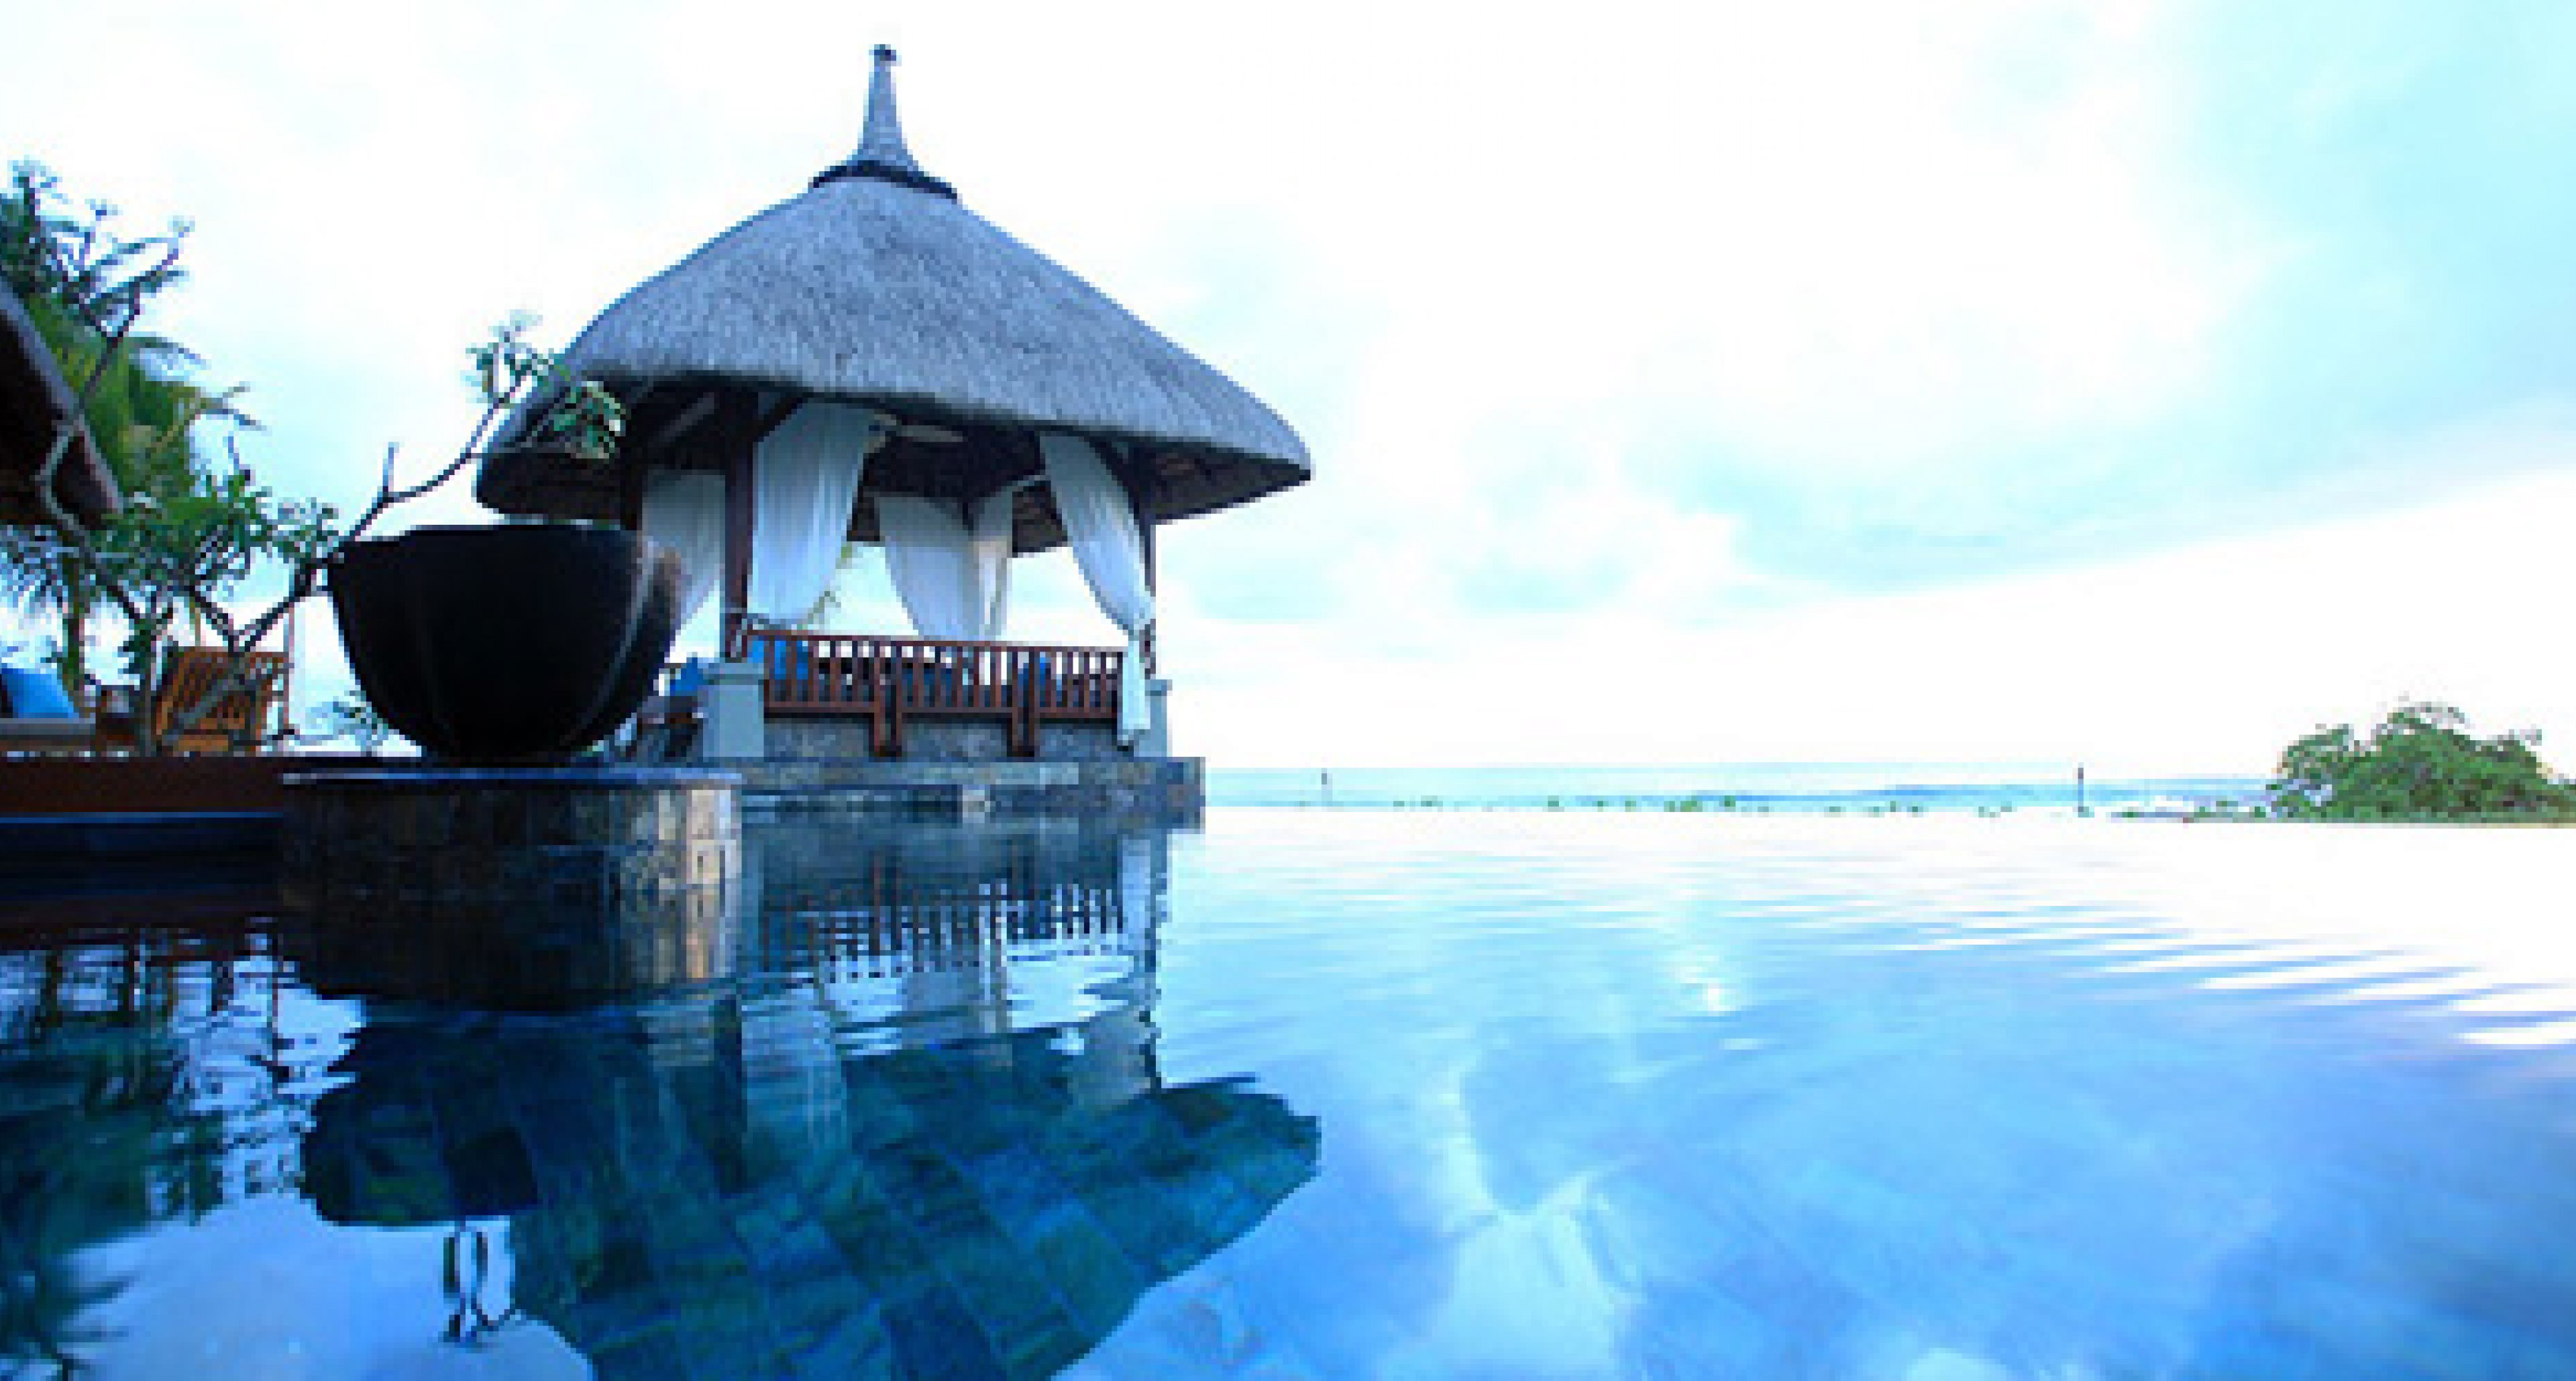 Shanti Ananda Maurice Spa Resort: Change Your Life